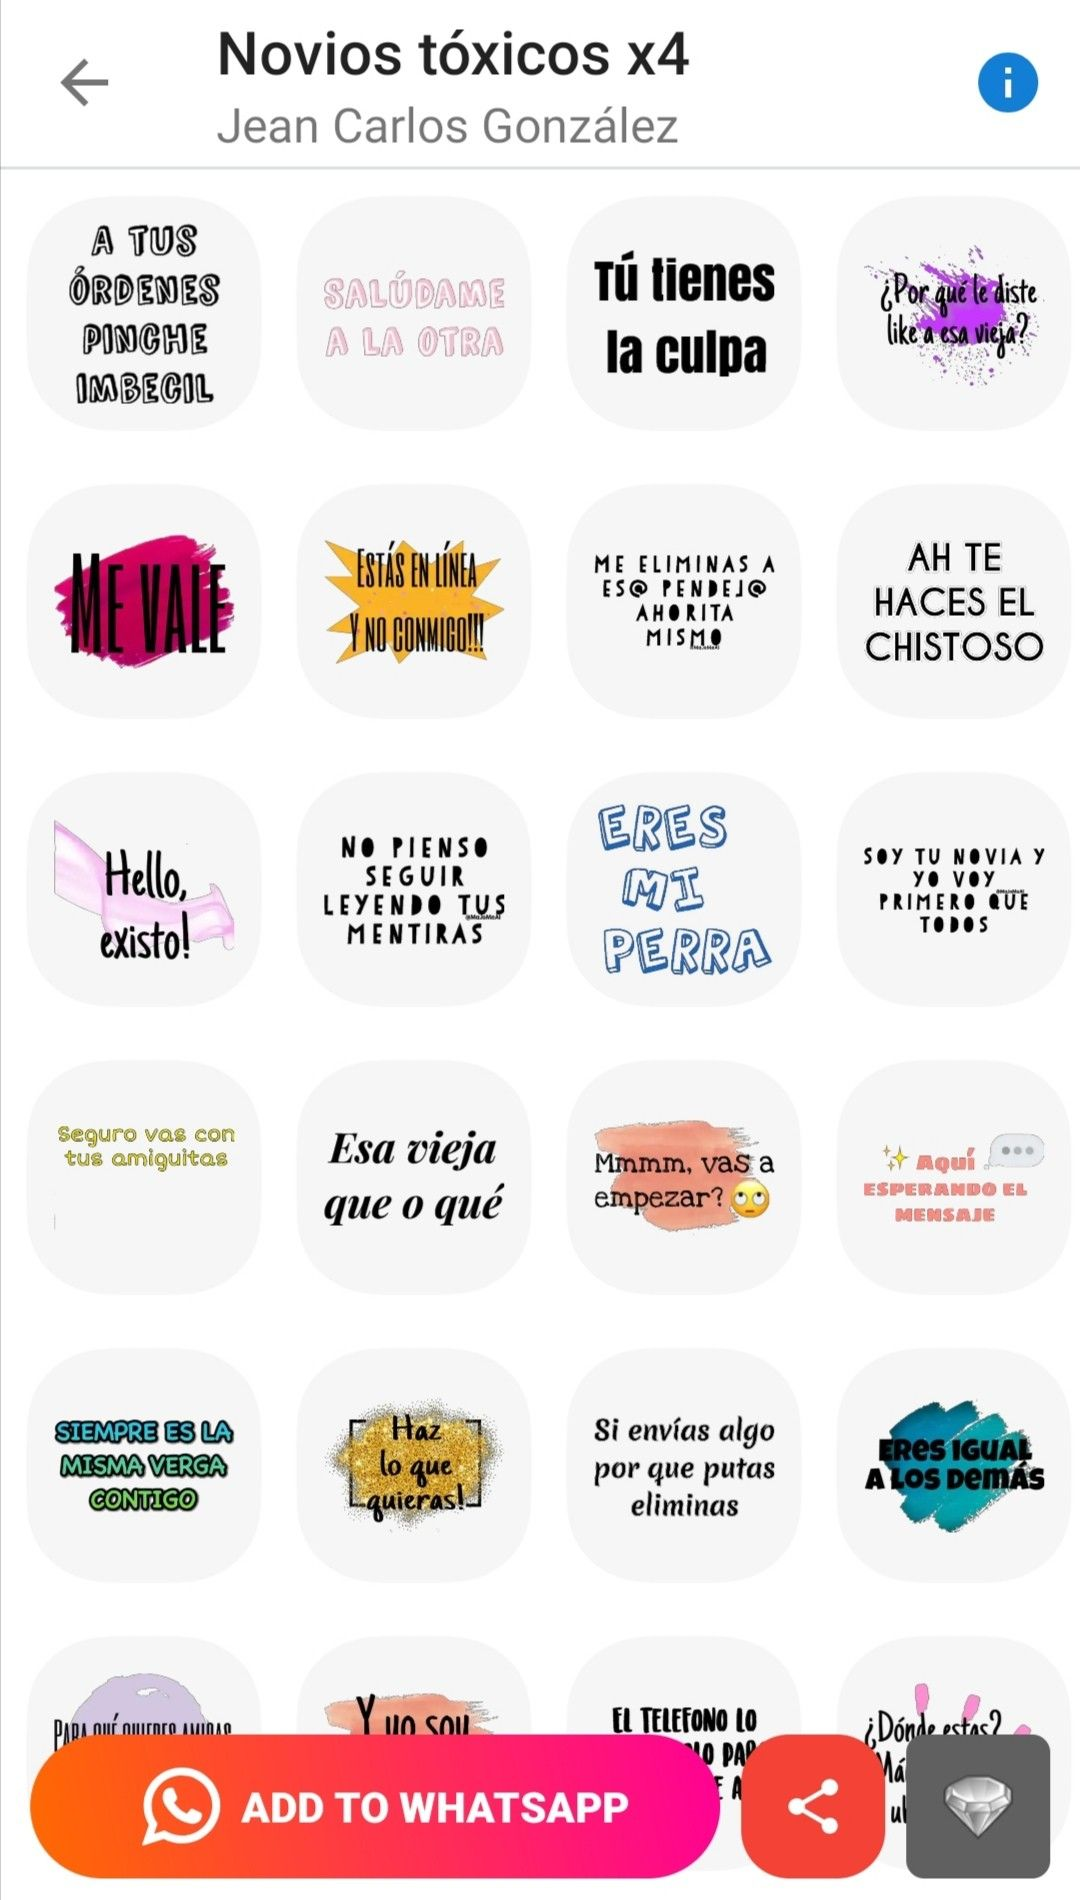 Stickers De Novios Toxicos Chiste De Novios Frases Bonitas Para Novios Novios